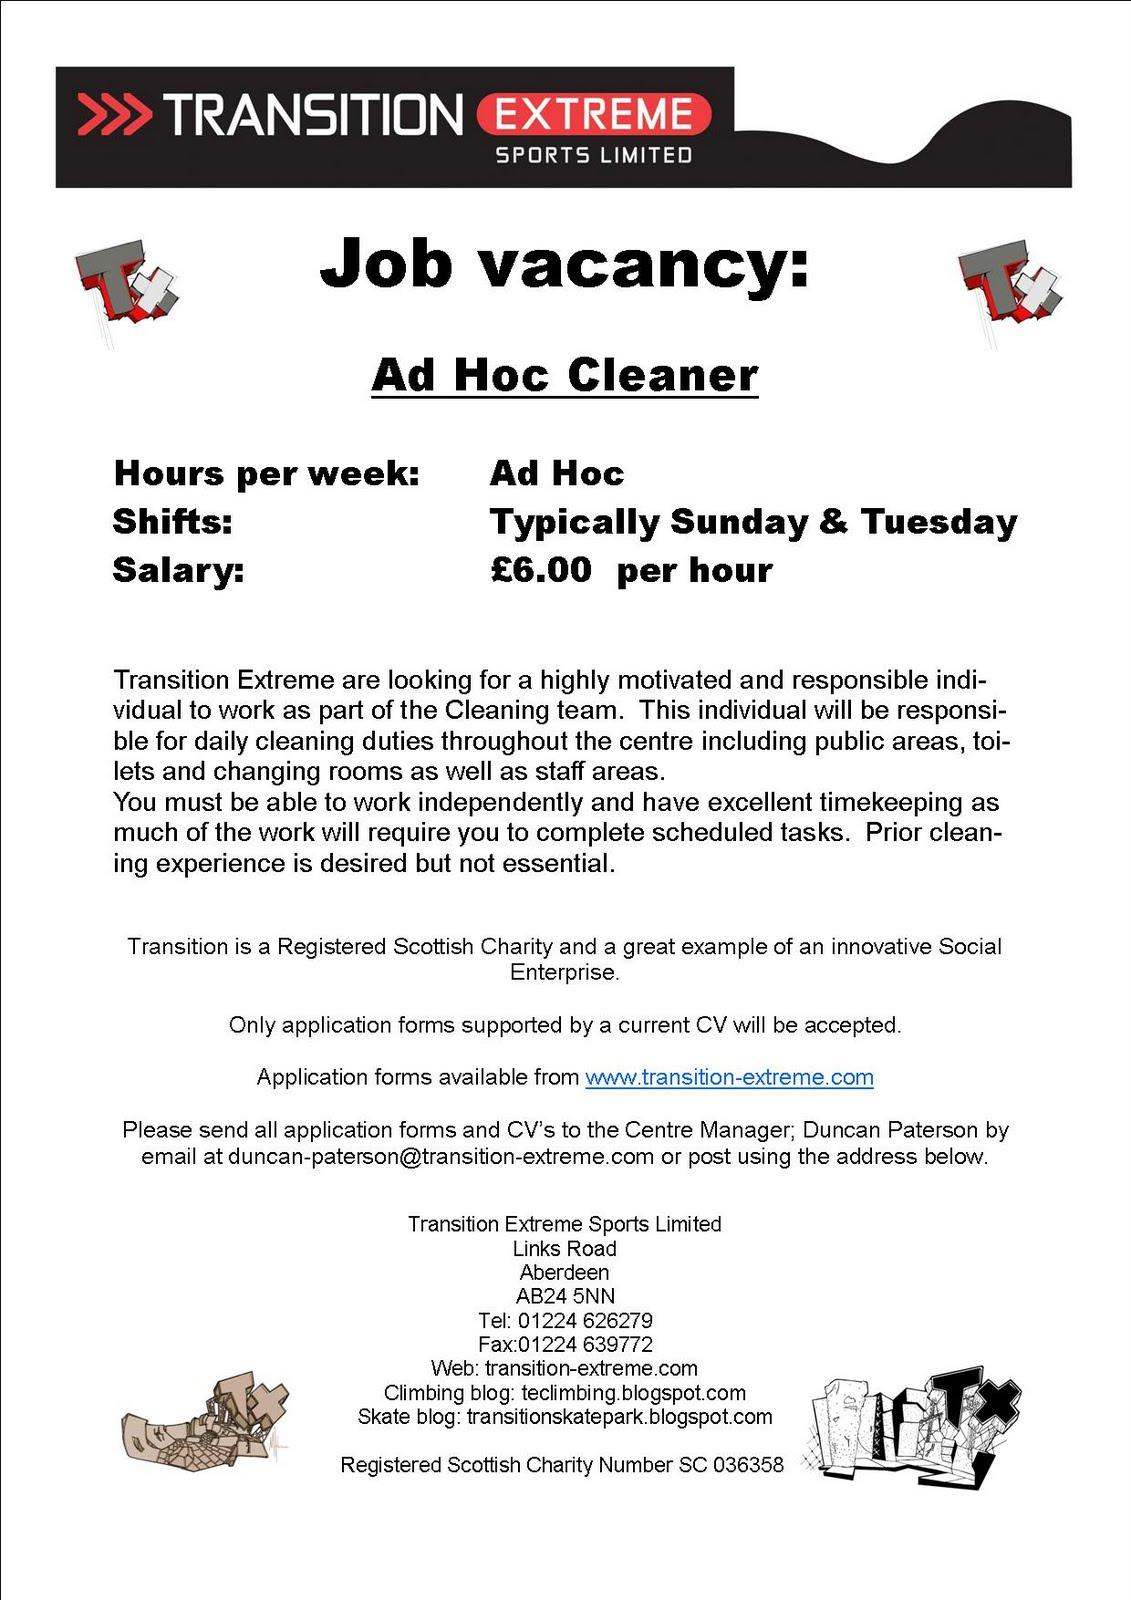 Transition Extreme Climbing: Job Vacancy